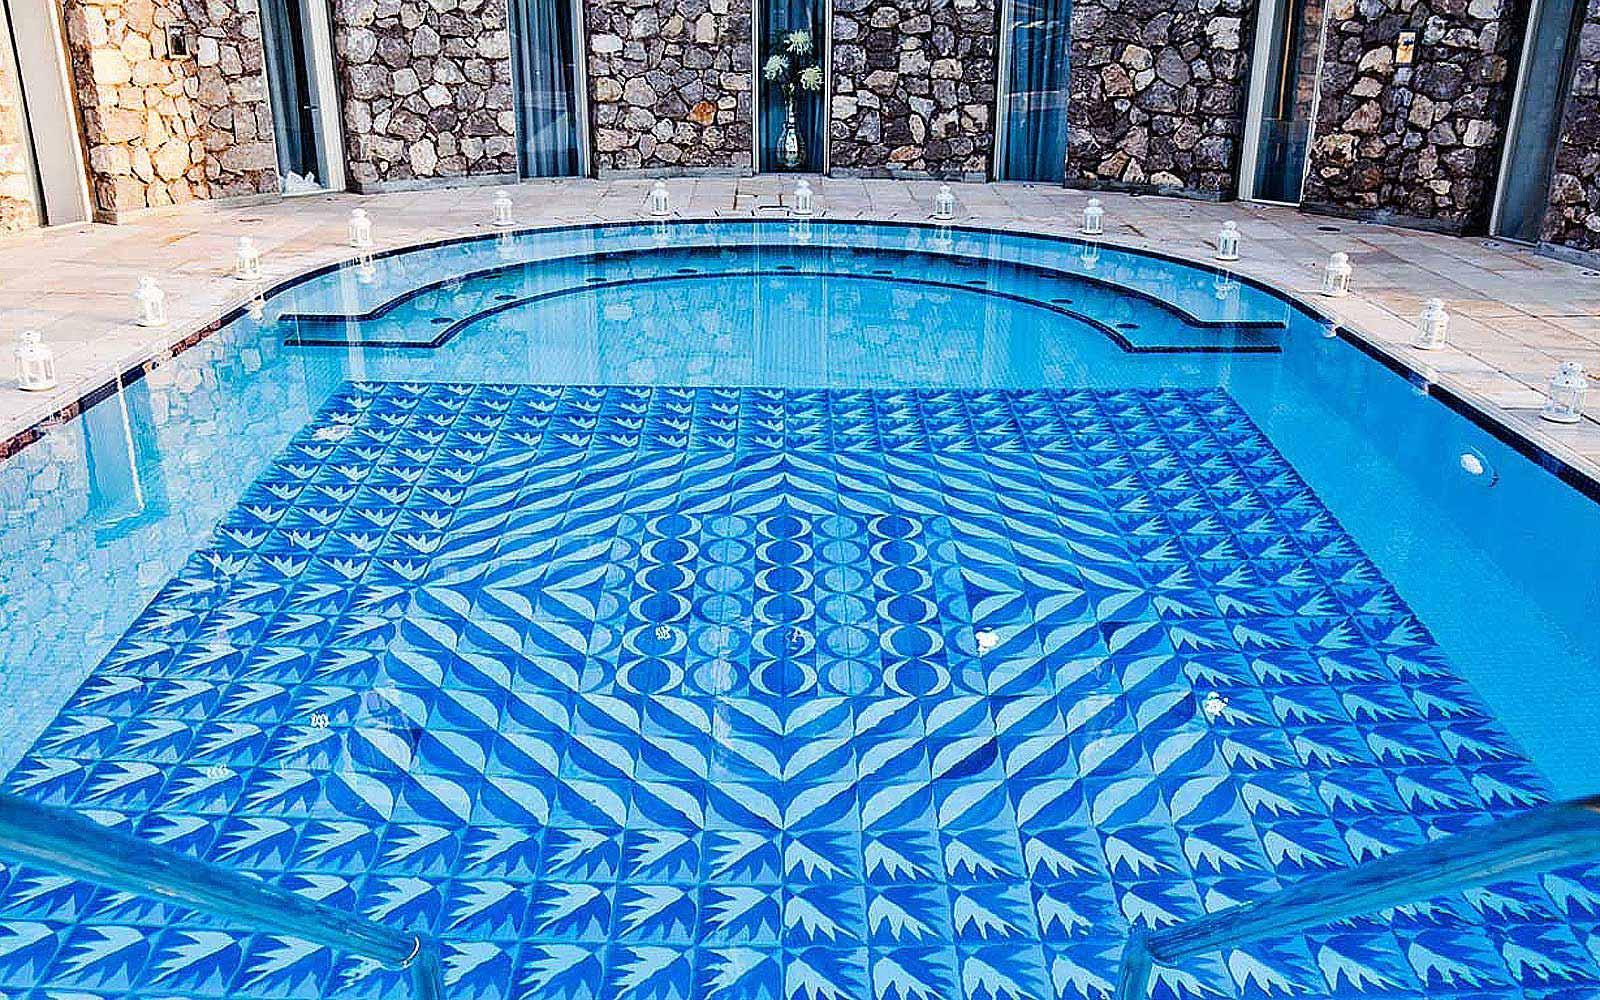 Swimming pool at Villa Marini Capri Hotel & Spa